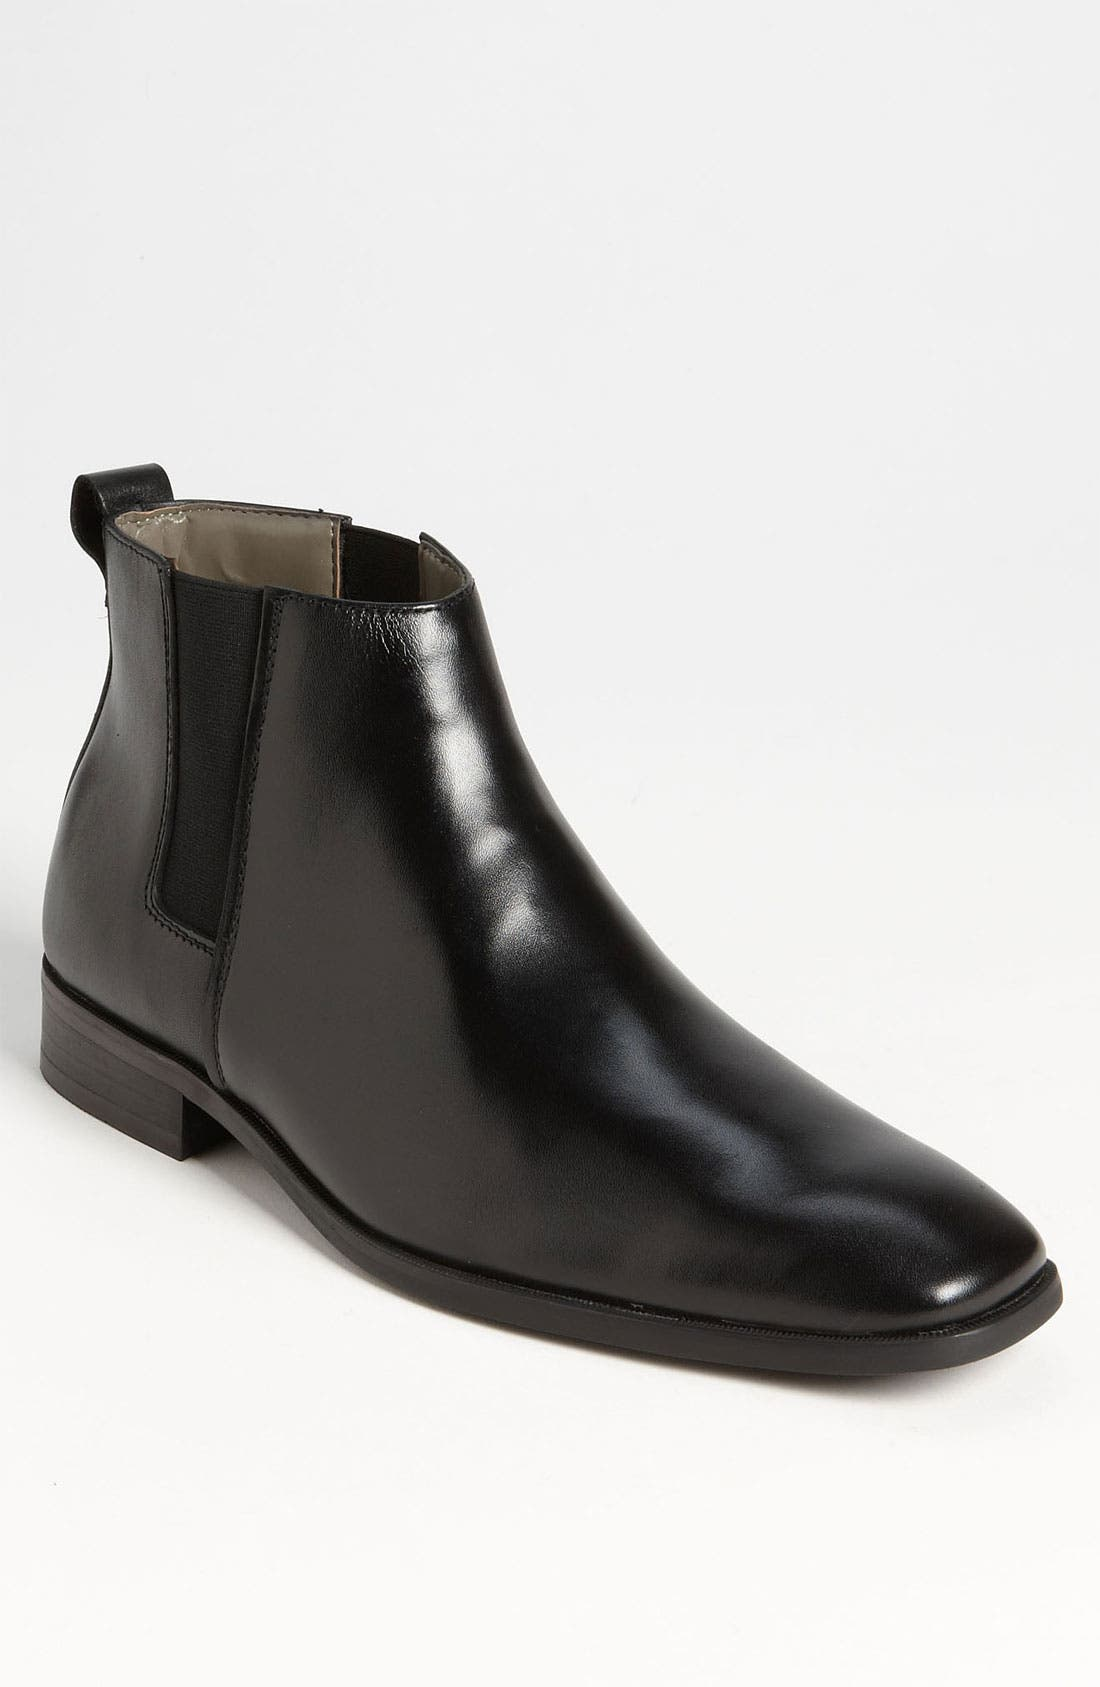 Alternate Image 1 Selected - Calvin Klein 'Galen' Chelsea Boot (Online Exclusive)